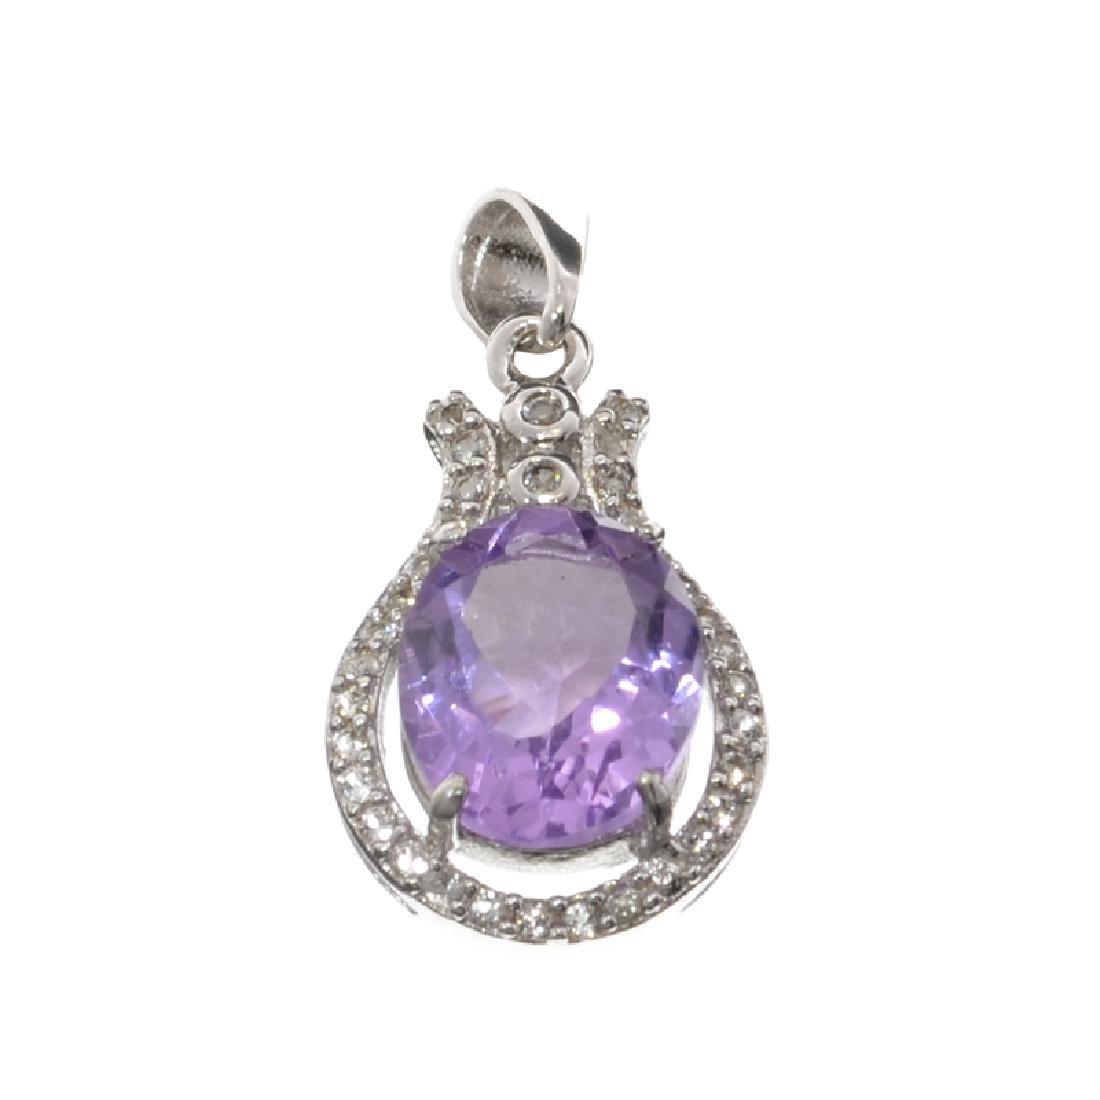 APP: 0.8k Fine Jewelry 3.60CT Purple Amethyst And White